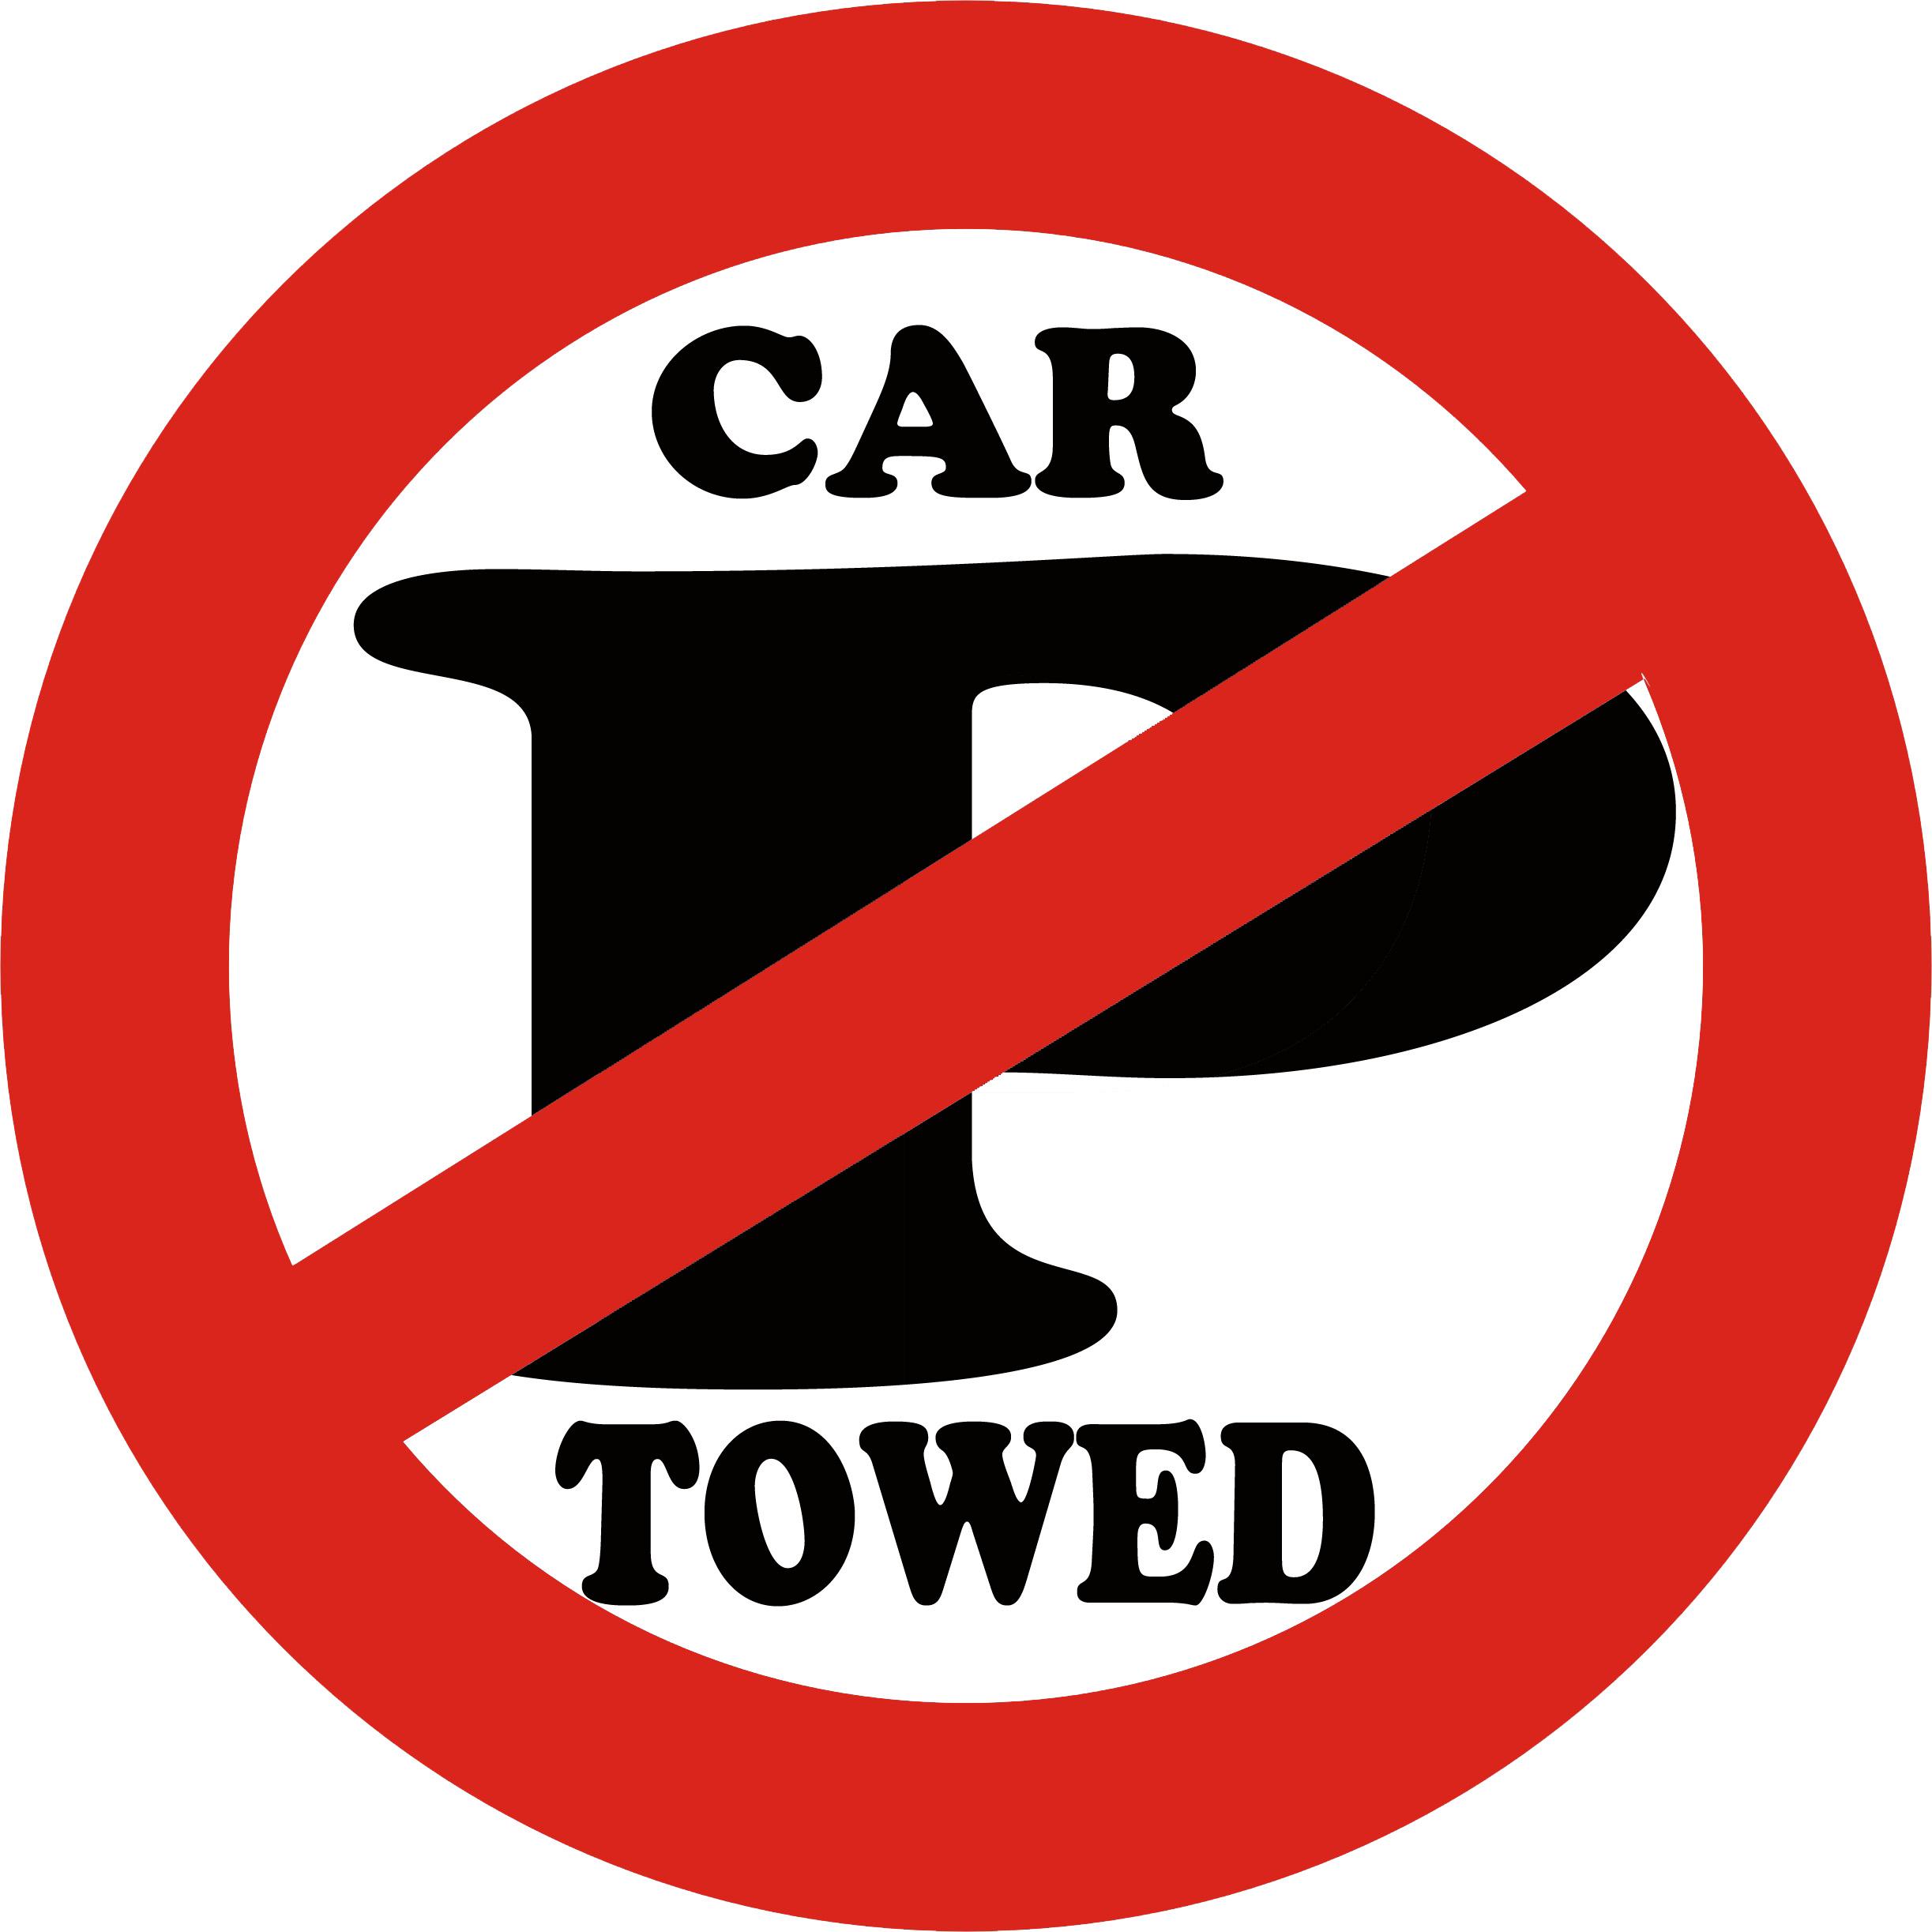 Towed Car Chicago CARTOWED